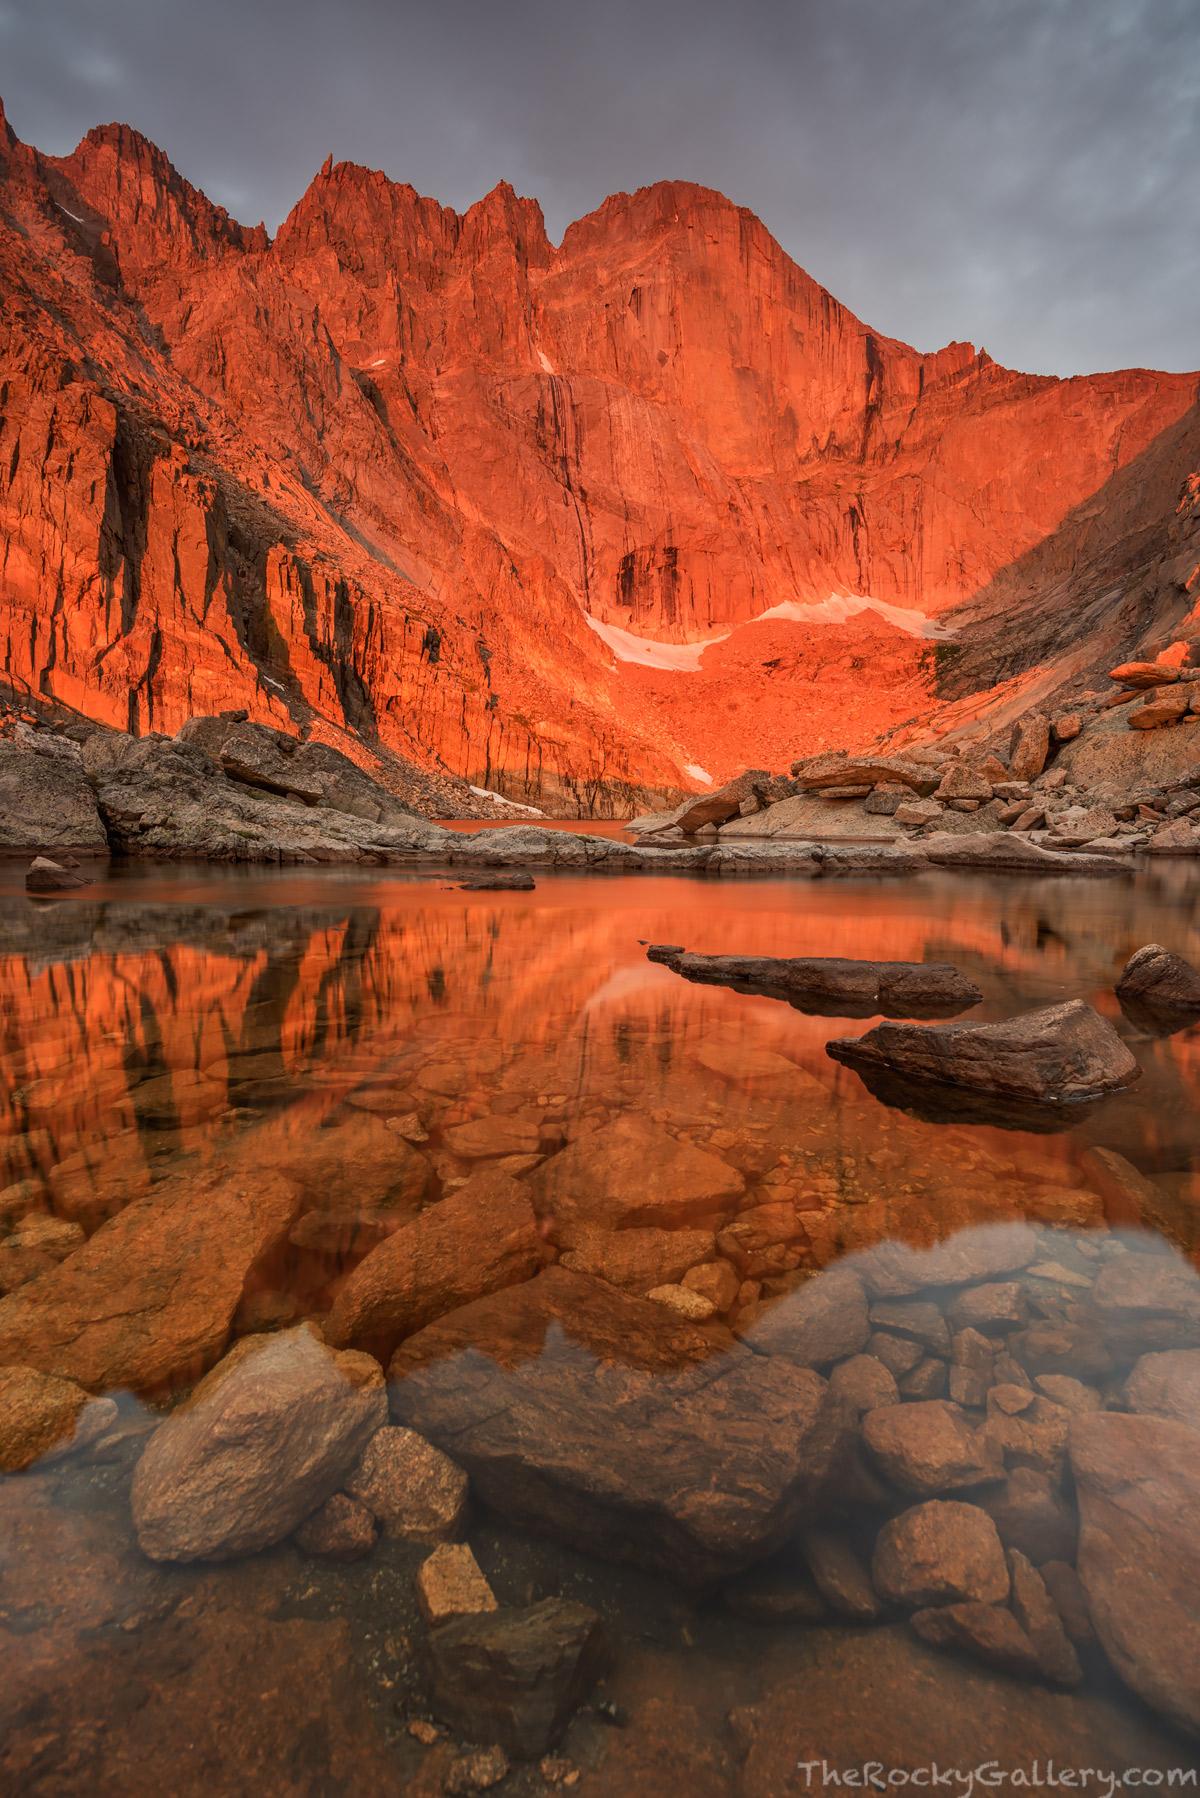 Longs Peak,14,259ft,14er,Chasm Lake,sunrise,landscape,photography,RMNP,Rocky Mountain National Park,Colorado,The Diamond,Longs Peak Trailhead,Estes Park,icon , photo